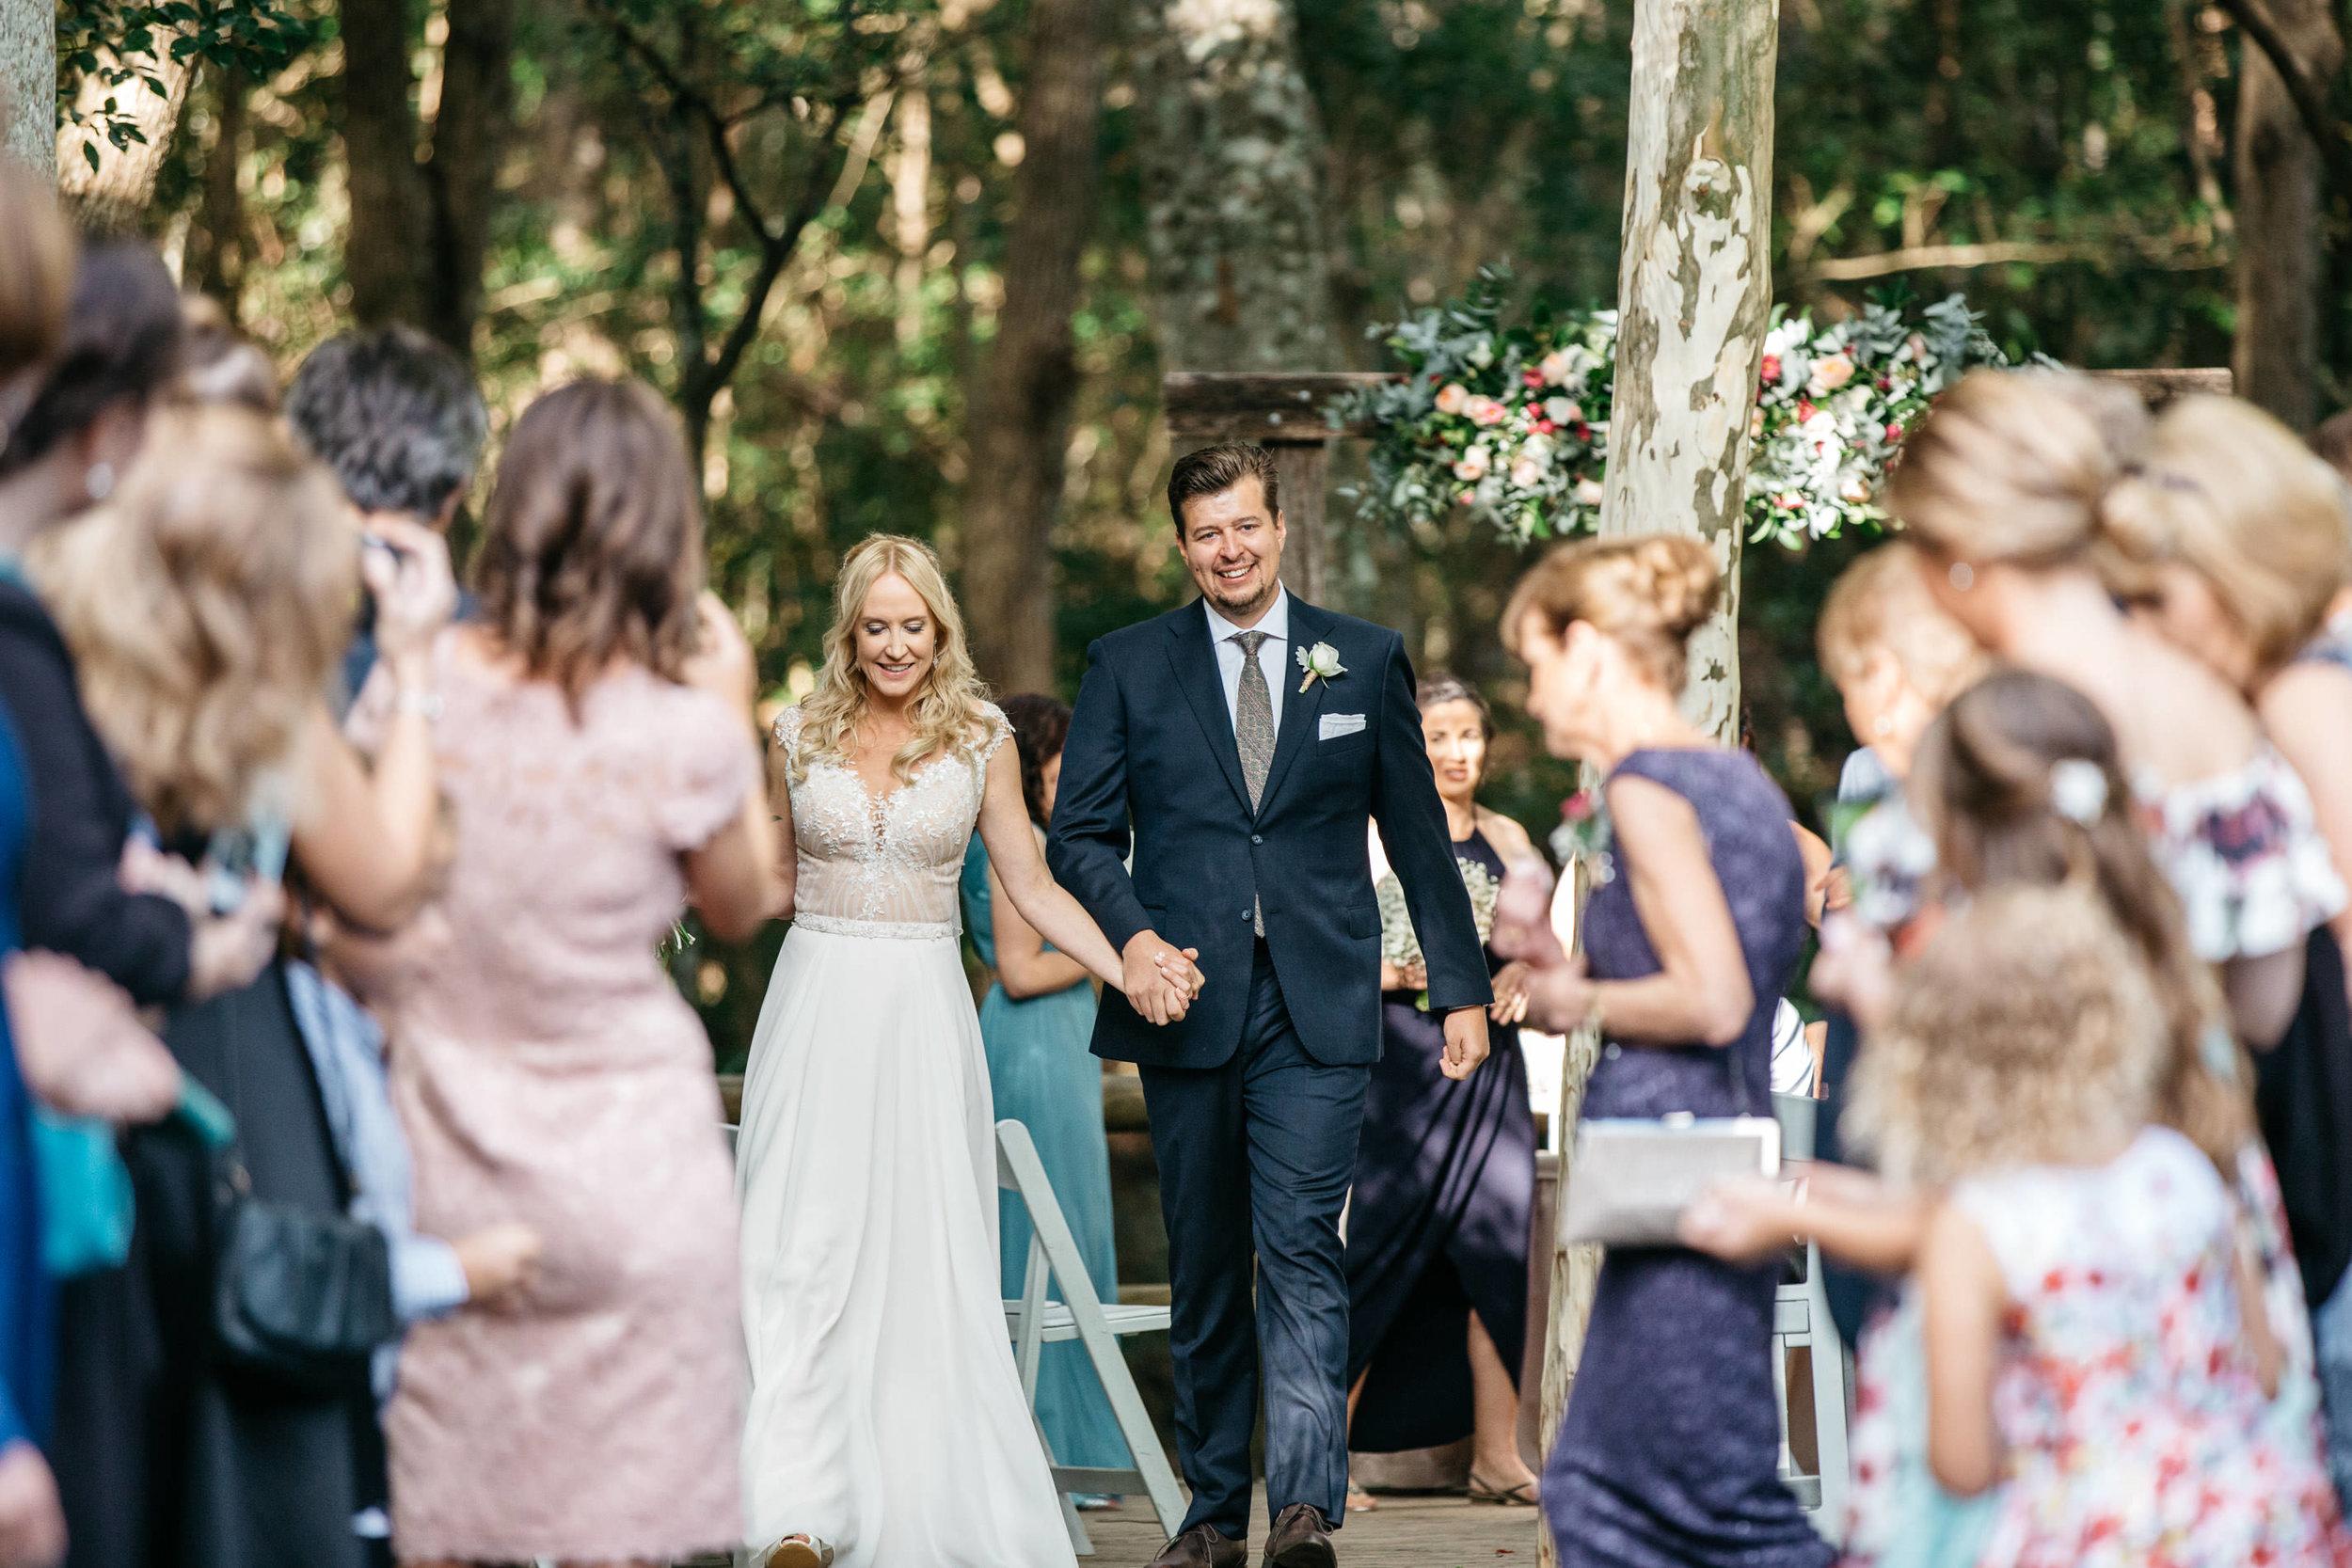 True North Photography_Boomerang Farm_Stacey and Isaac_Gold Coast Wedding_Barm Wedding_Hinterland Wedding-111.jpg